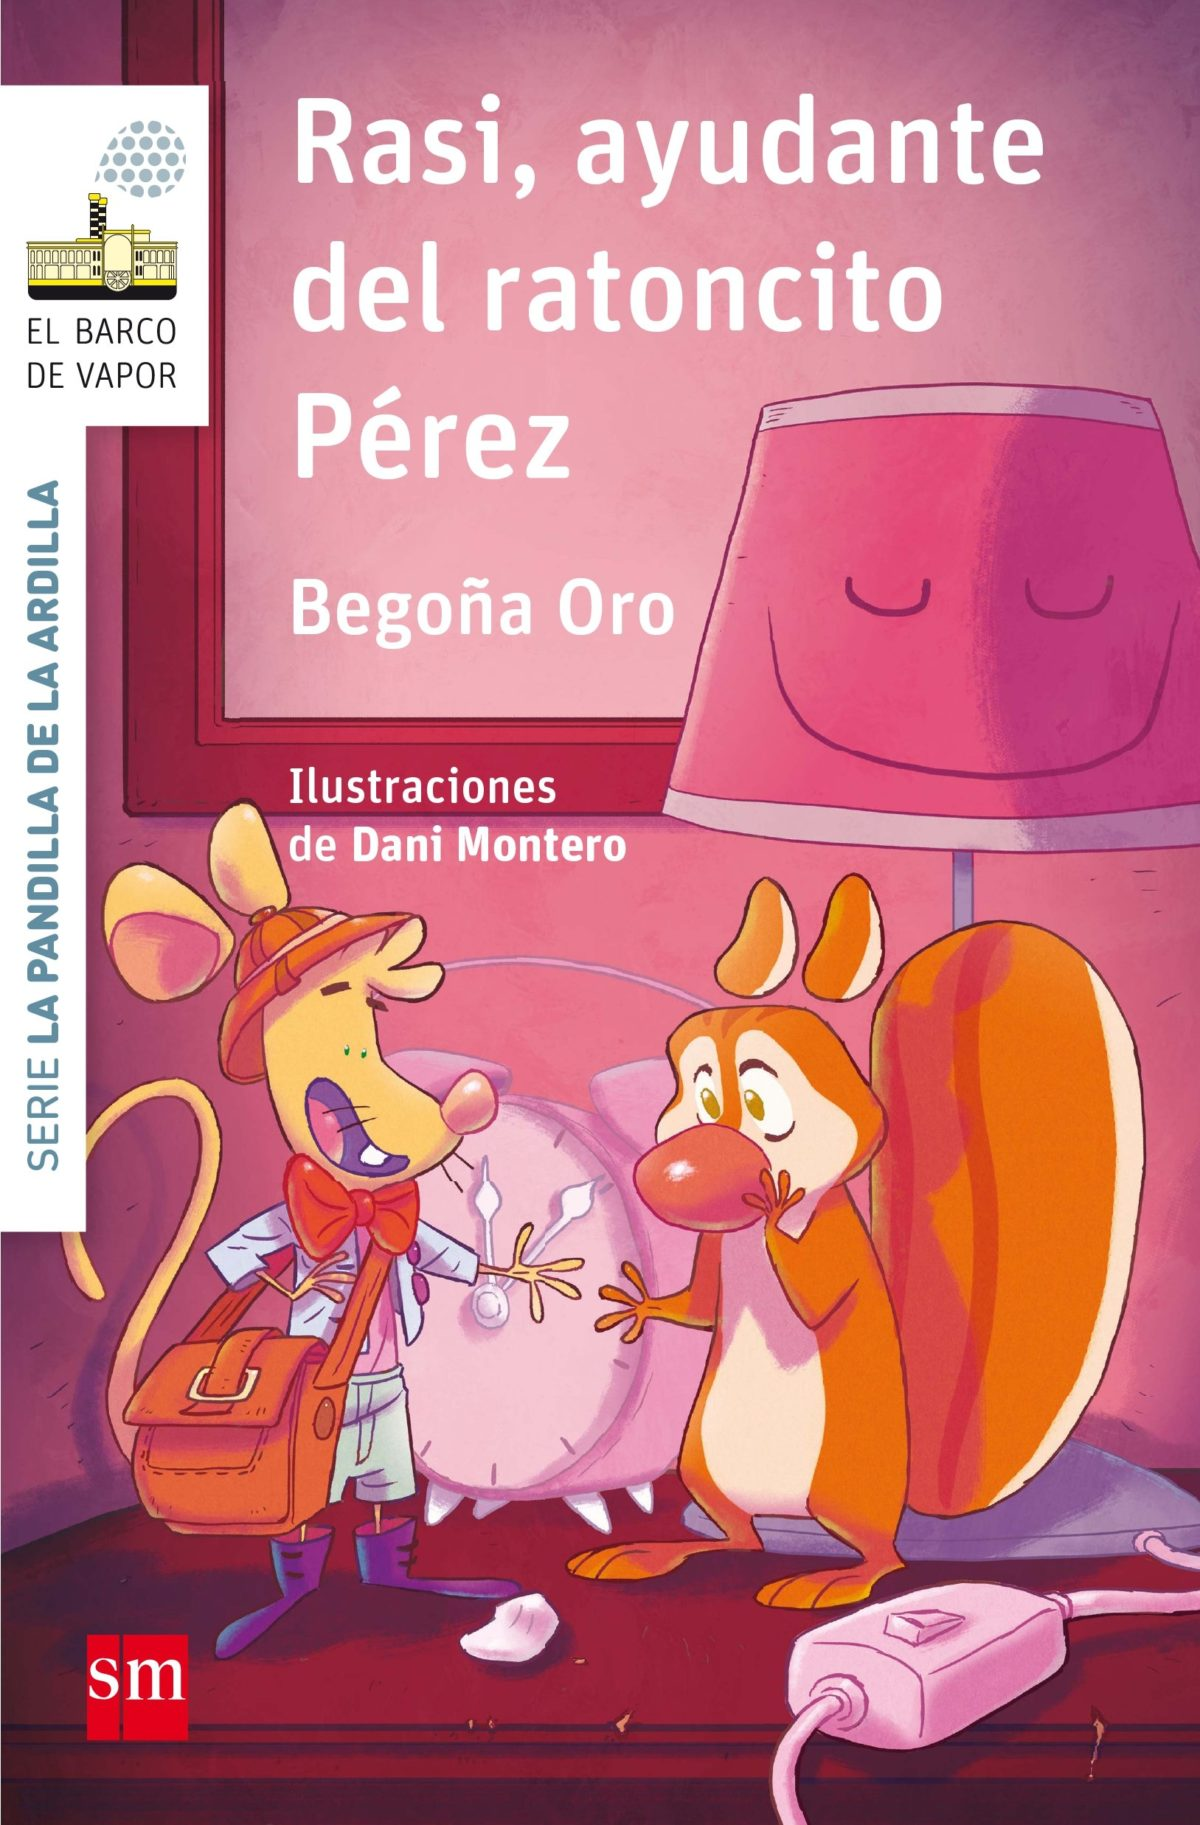 Rasi, ayudante del ratoncito Pérez (El Barco de Vapor Blanca) (Español) Tapa blanda